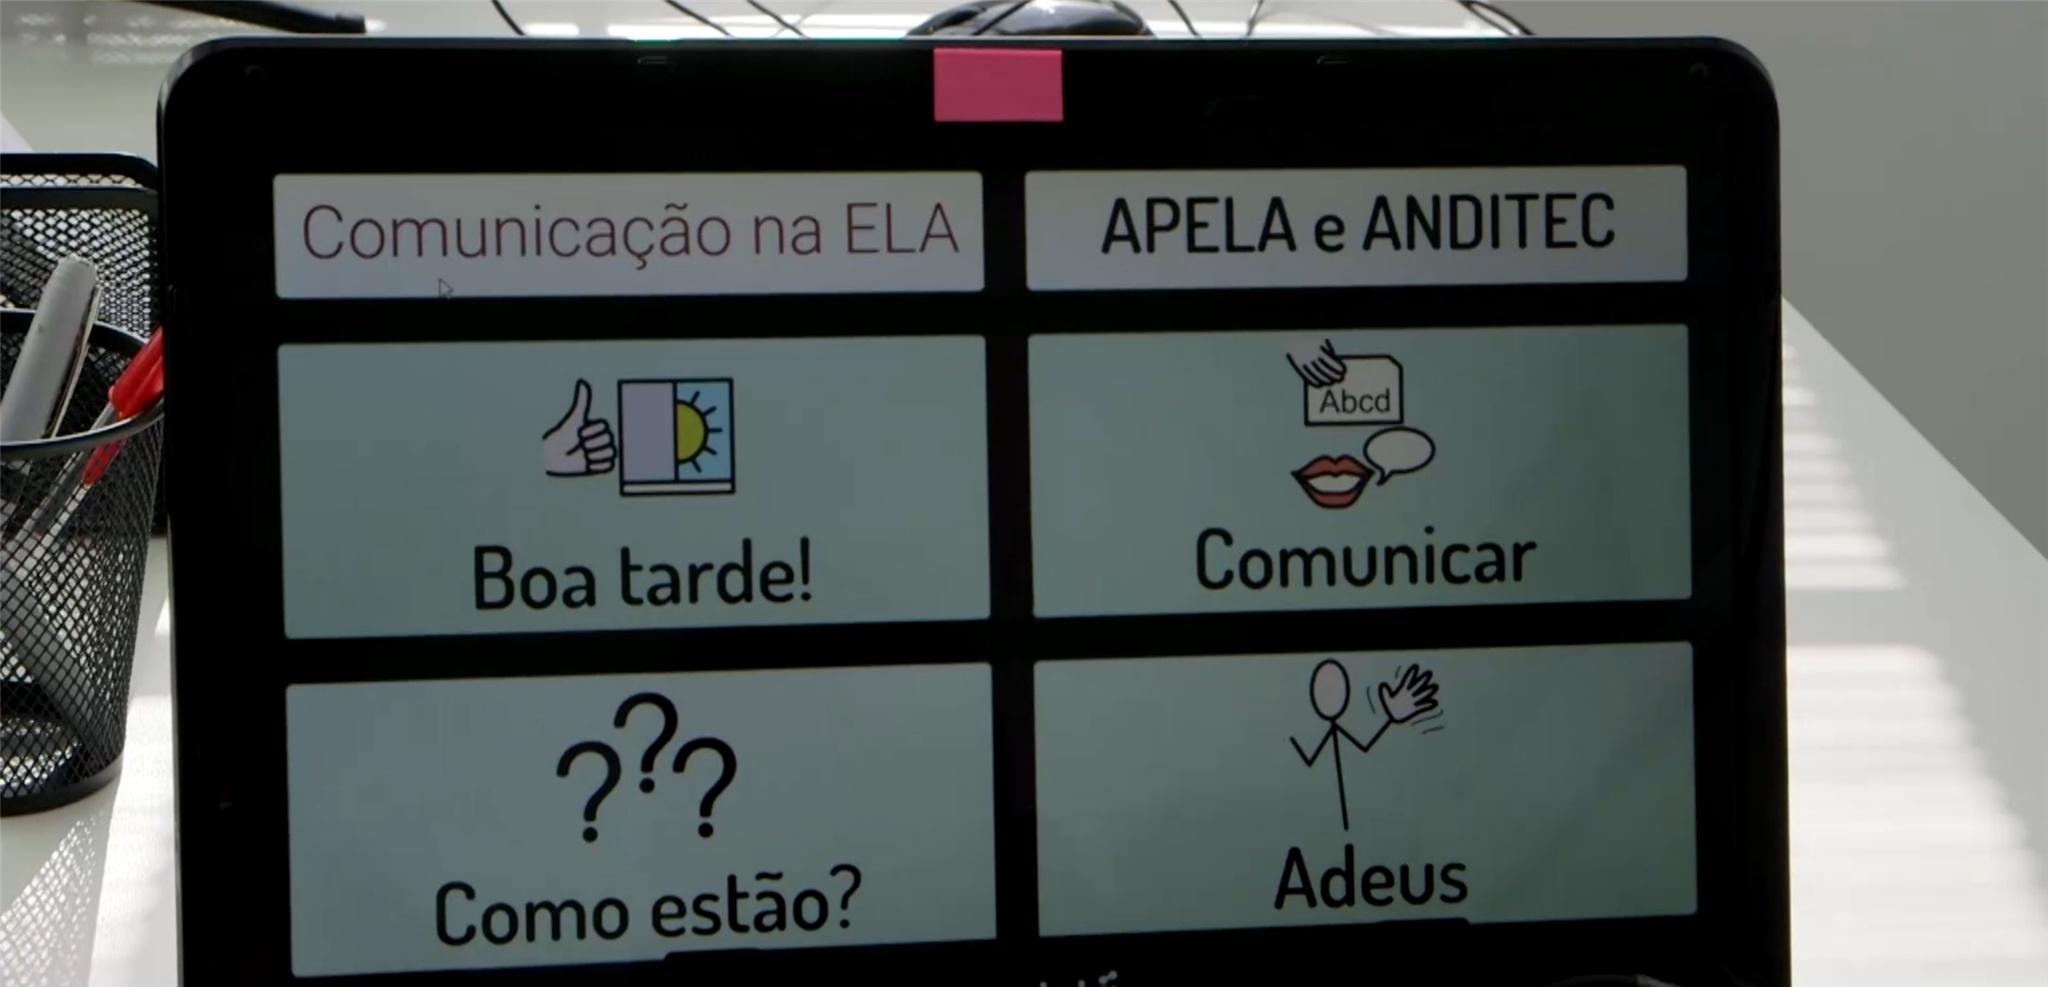 Portuguese grid 3